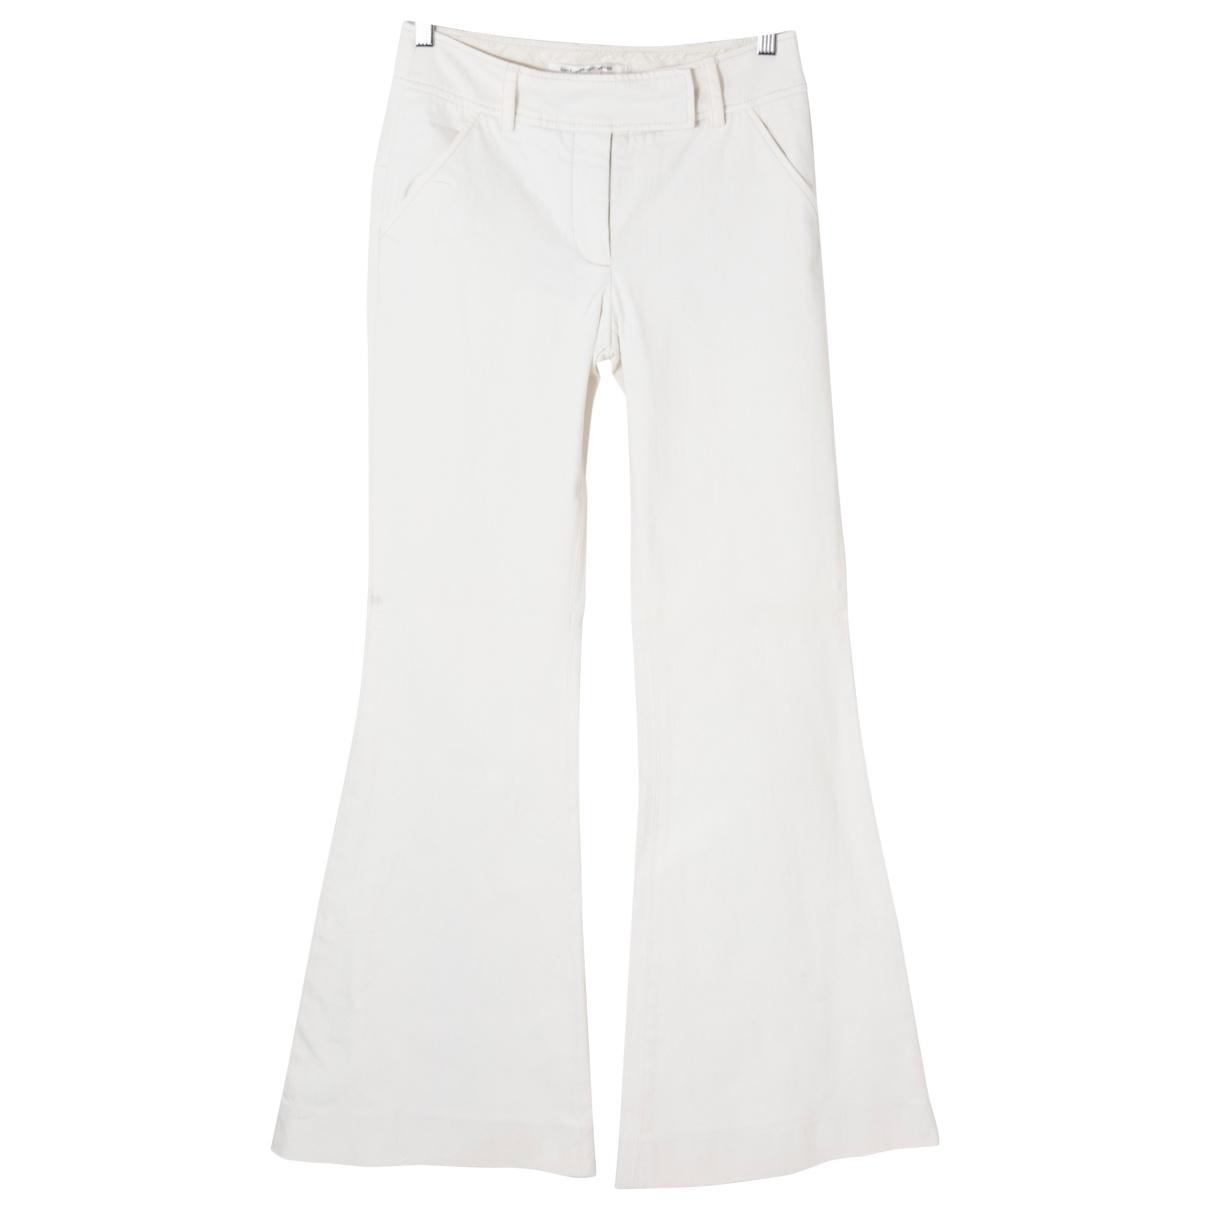 Pantalon en Algodon Crudo Diane Von Furstenberg